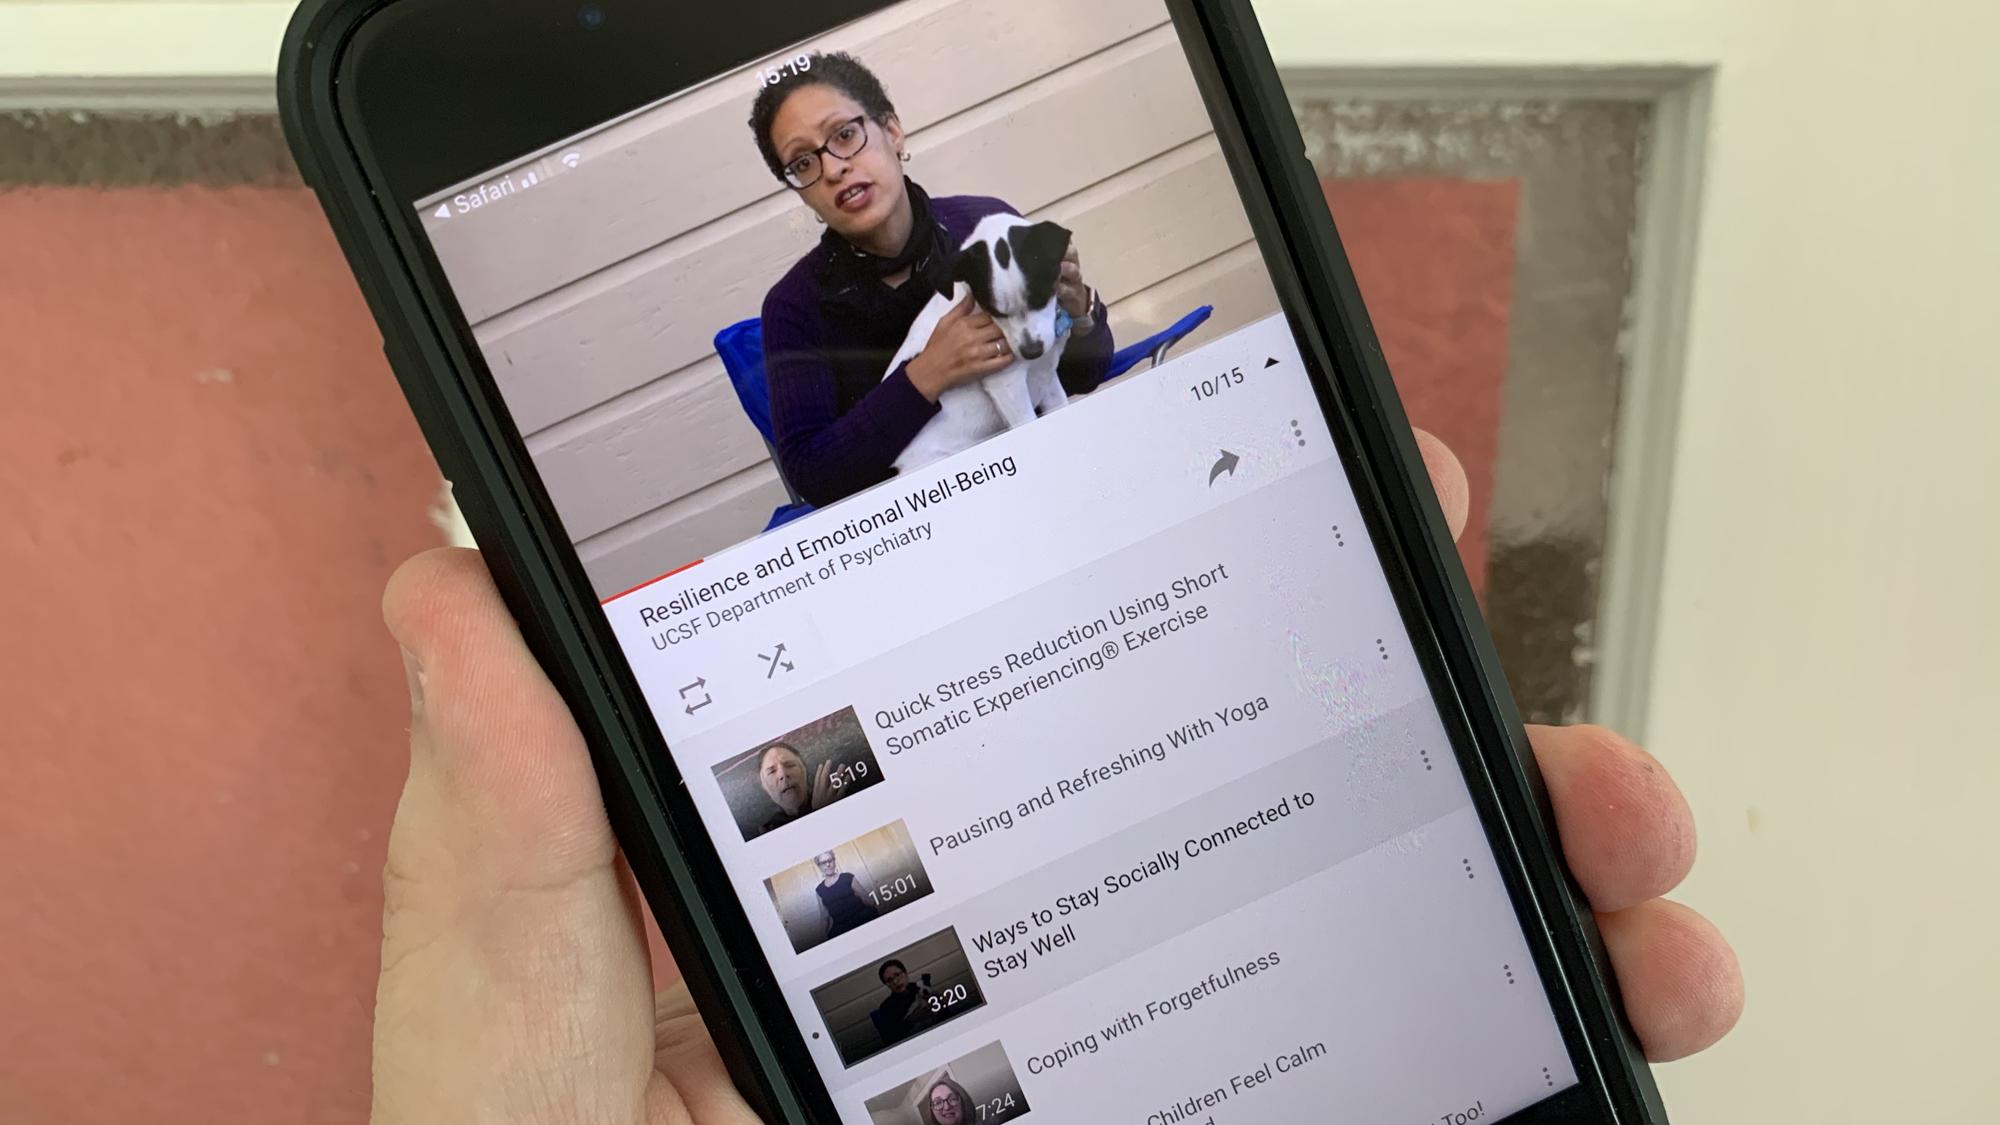 Videos on phone